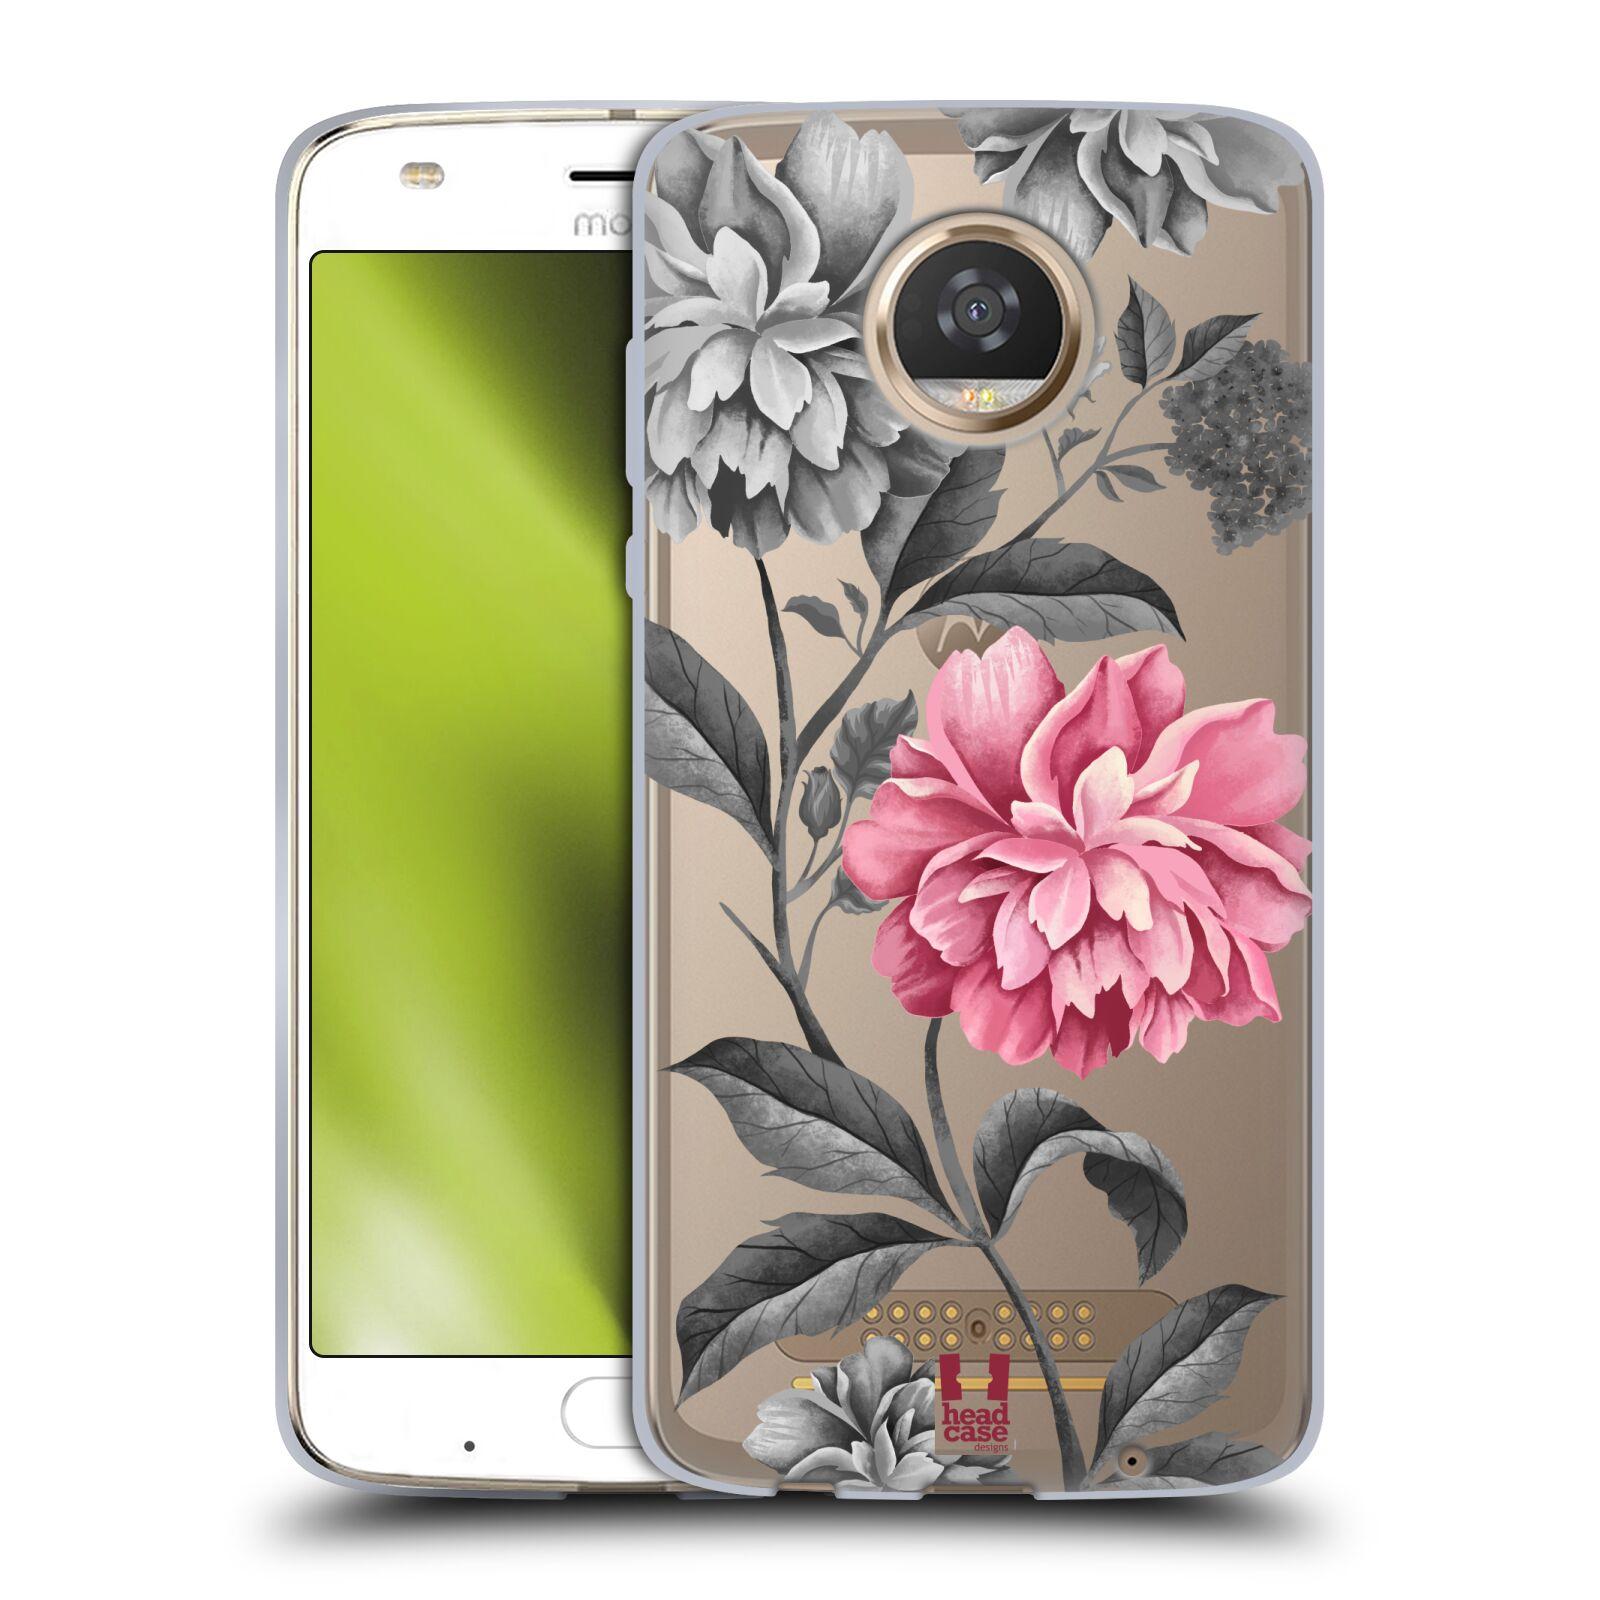 CASE-DESIGNS-SERIE-AMOR-florece-Suave-HEAD-Gel-caso-para-telefonos-MOTOROLA